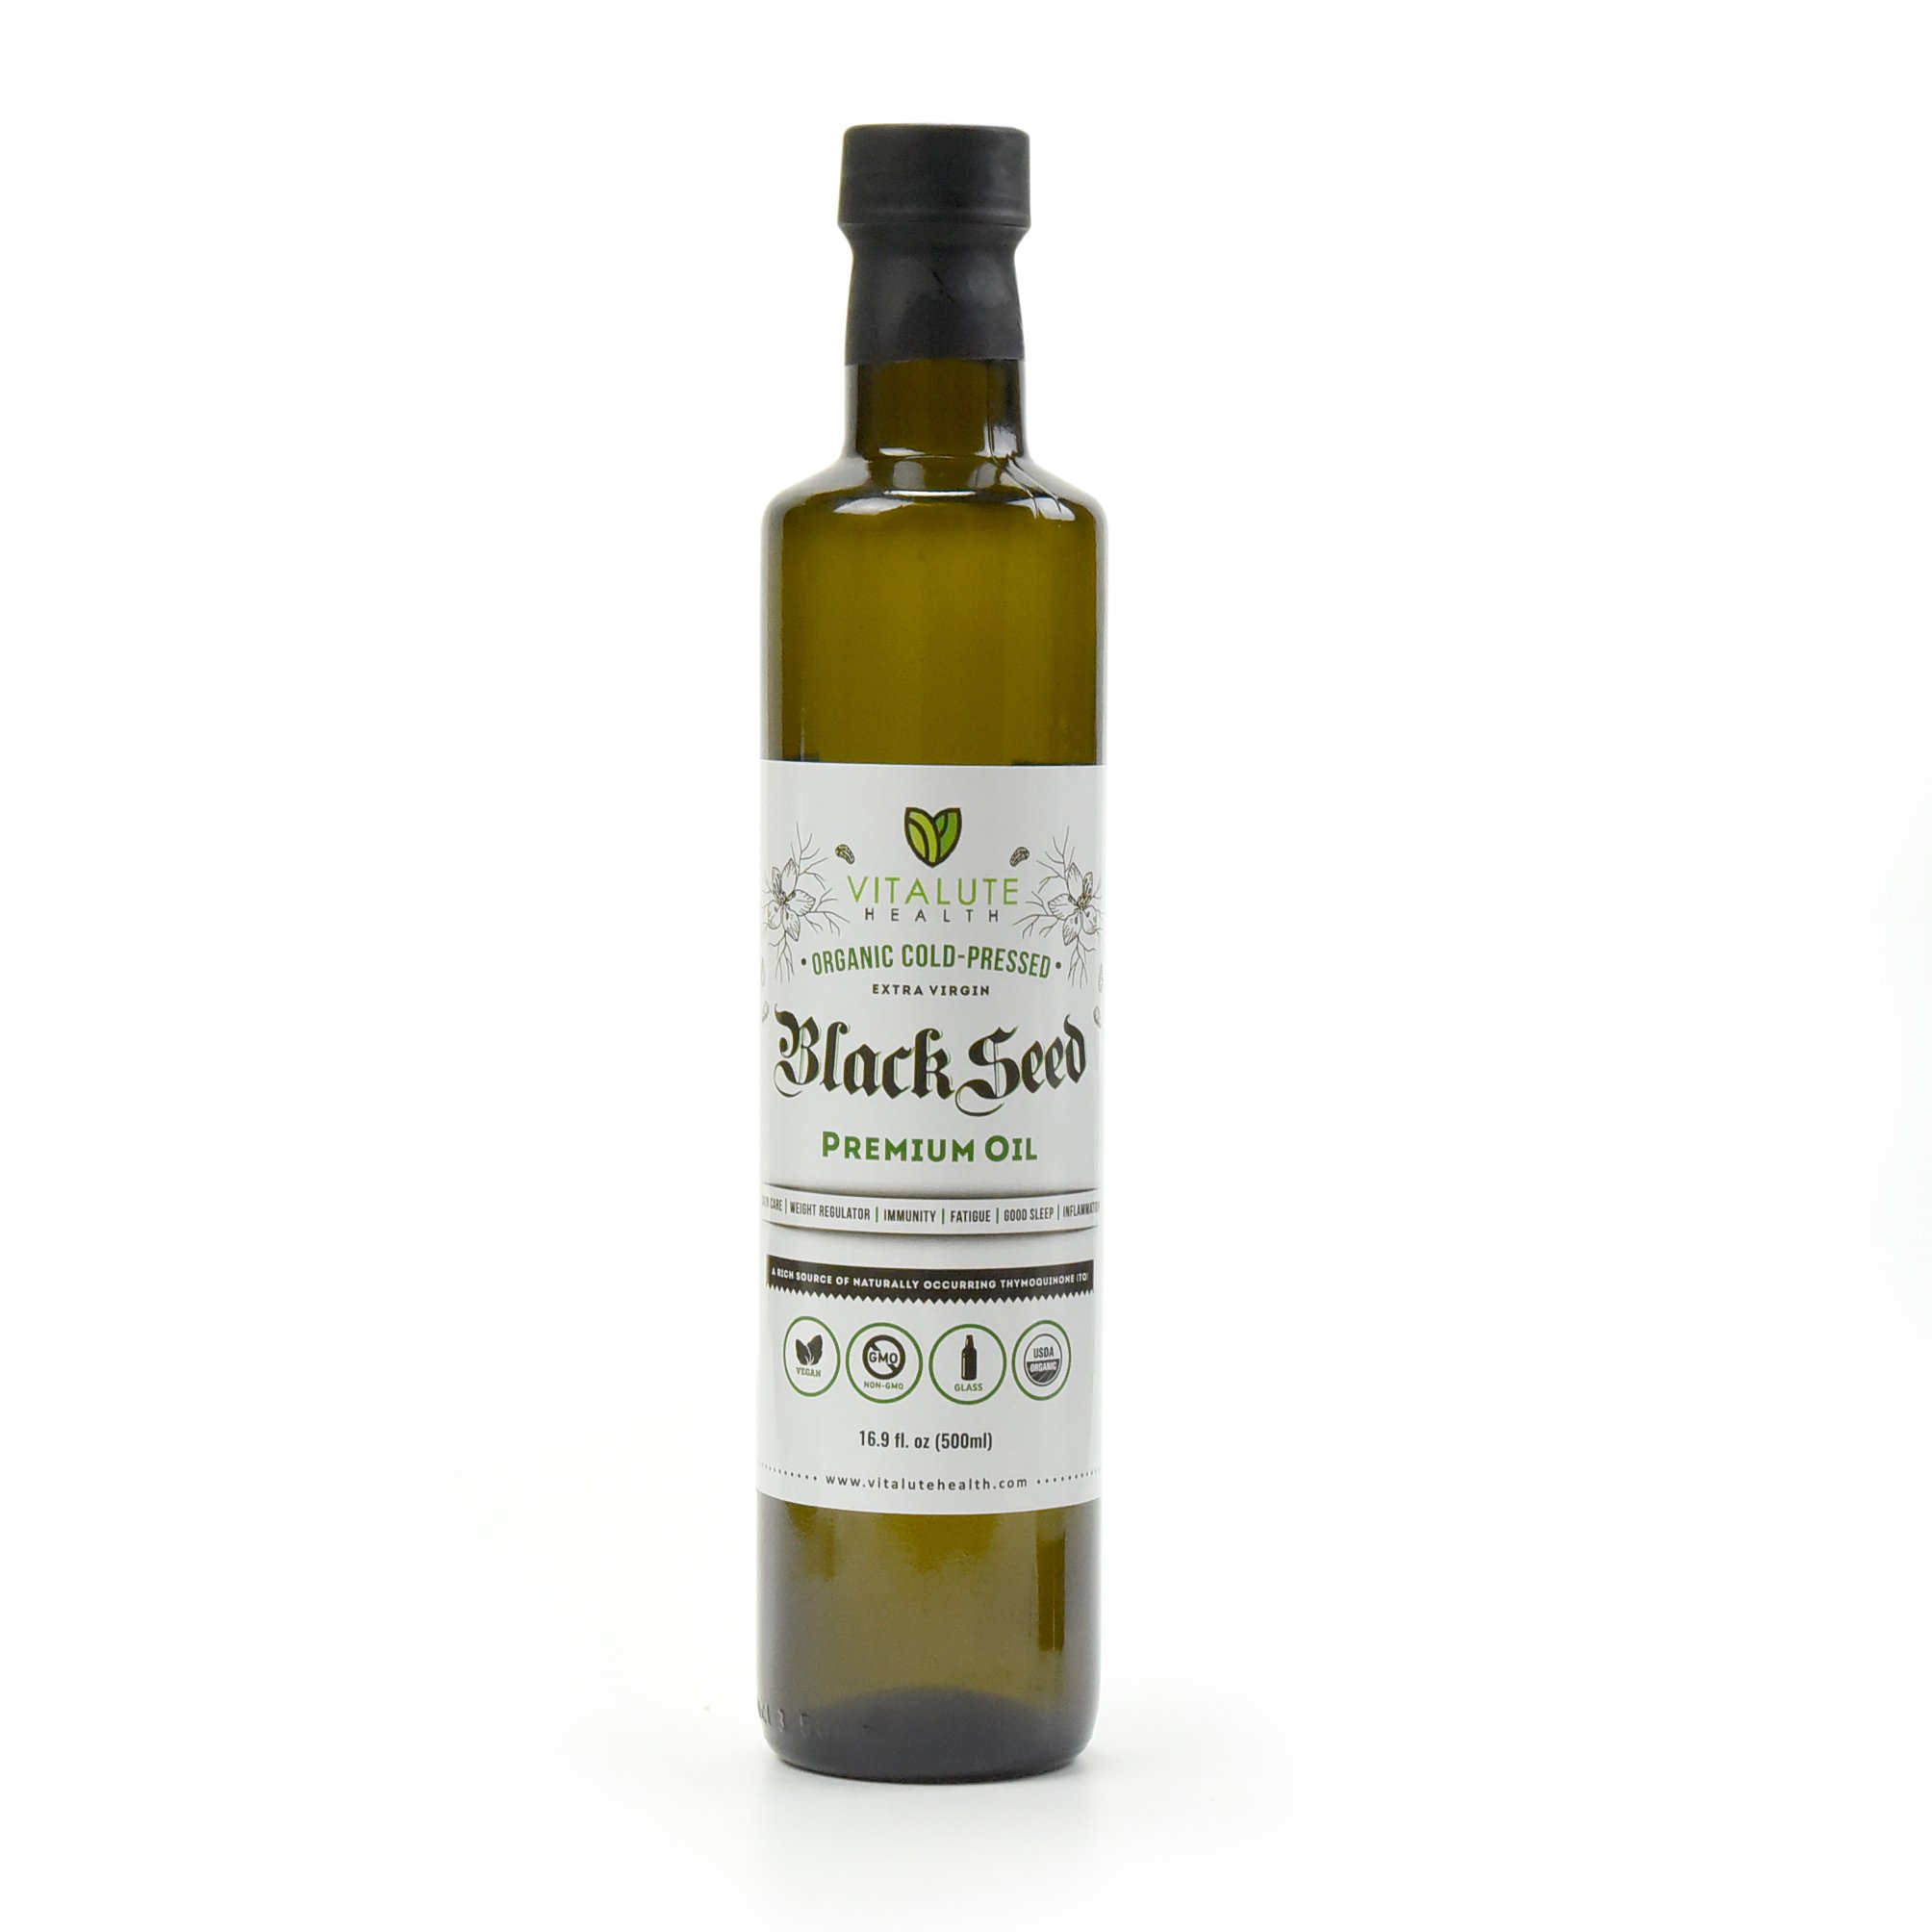 Vitalute Health Black Seed Oil - 16.9 fl.oz (500ml) - Organic, Cold Pressed, Extra Virgin, Premium Oil, Glass Bottle